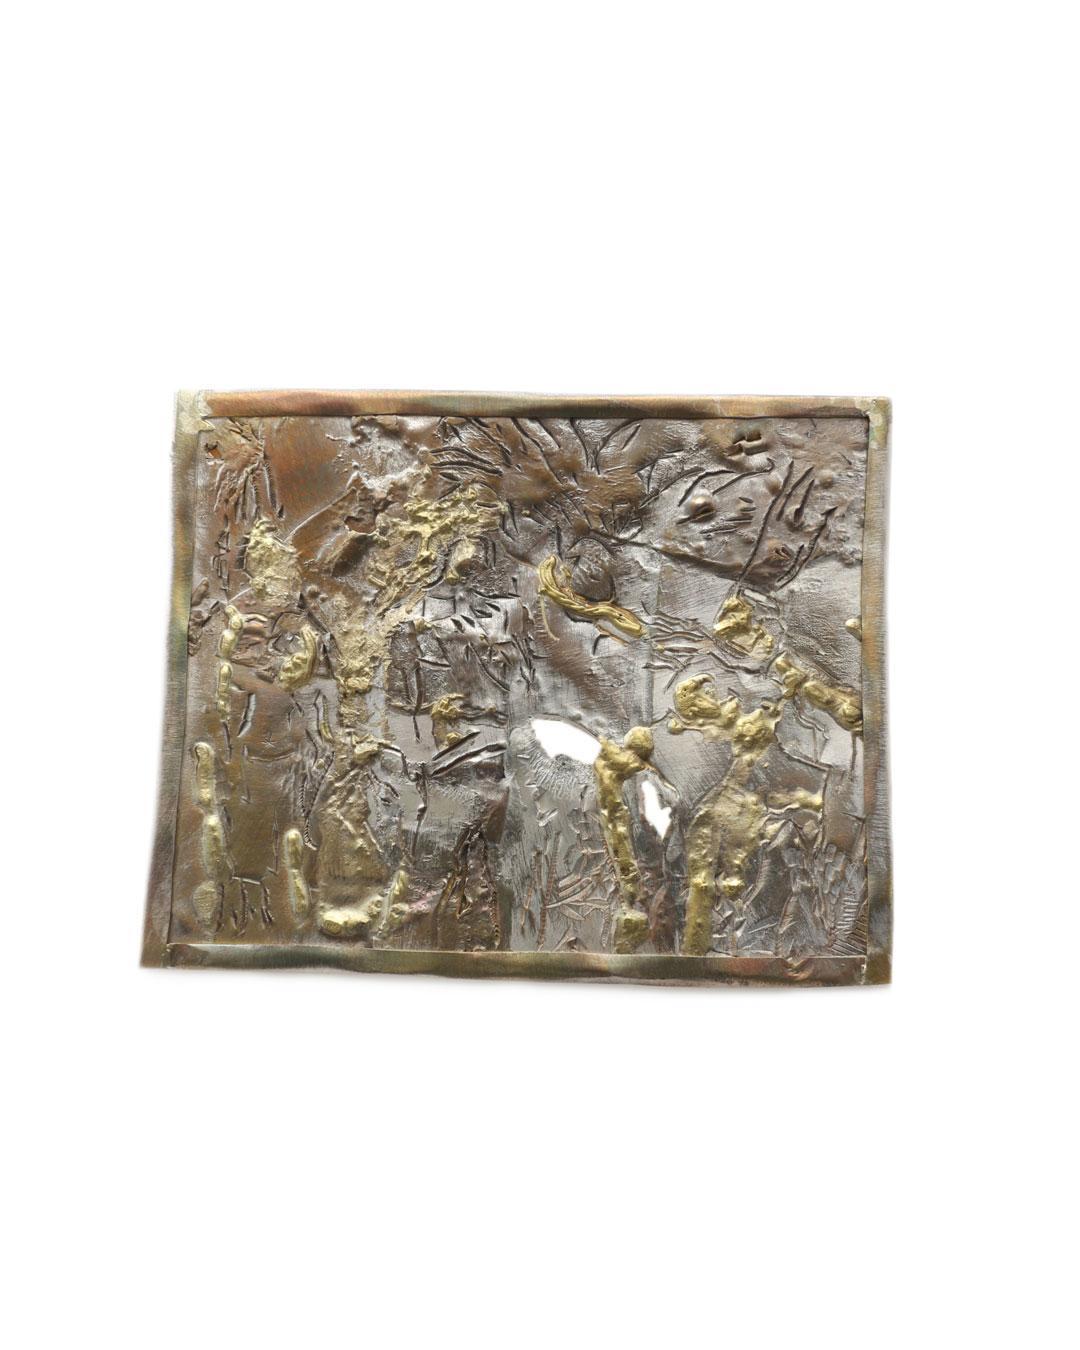 Rudolf Kocéa, Studio Olympia, 2016, brooch; silver, copper, gold, 105 x 130 mm, €2130